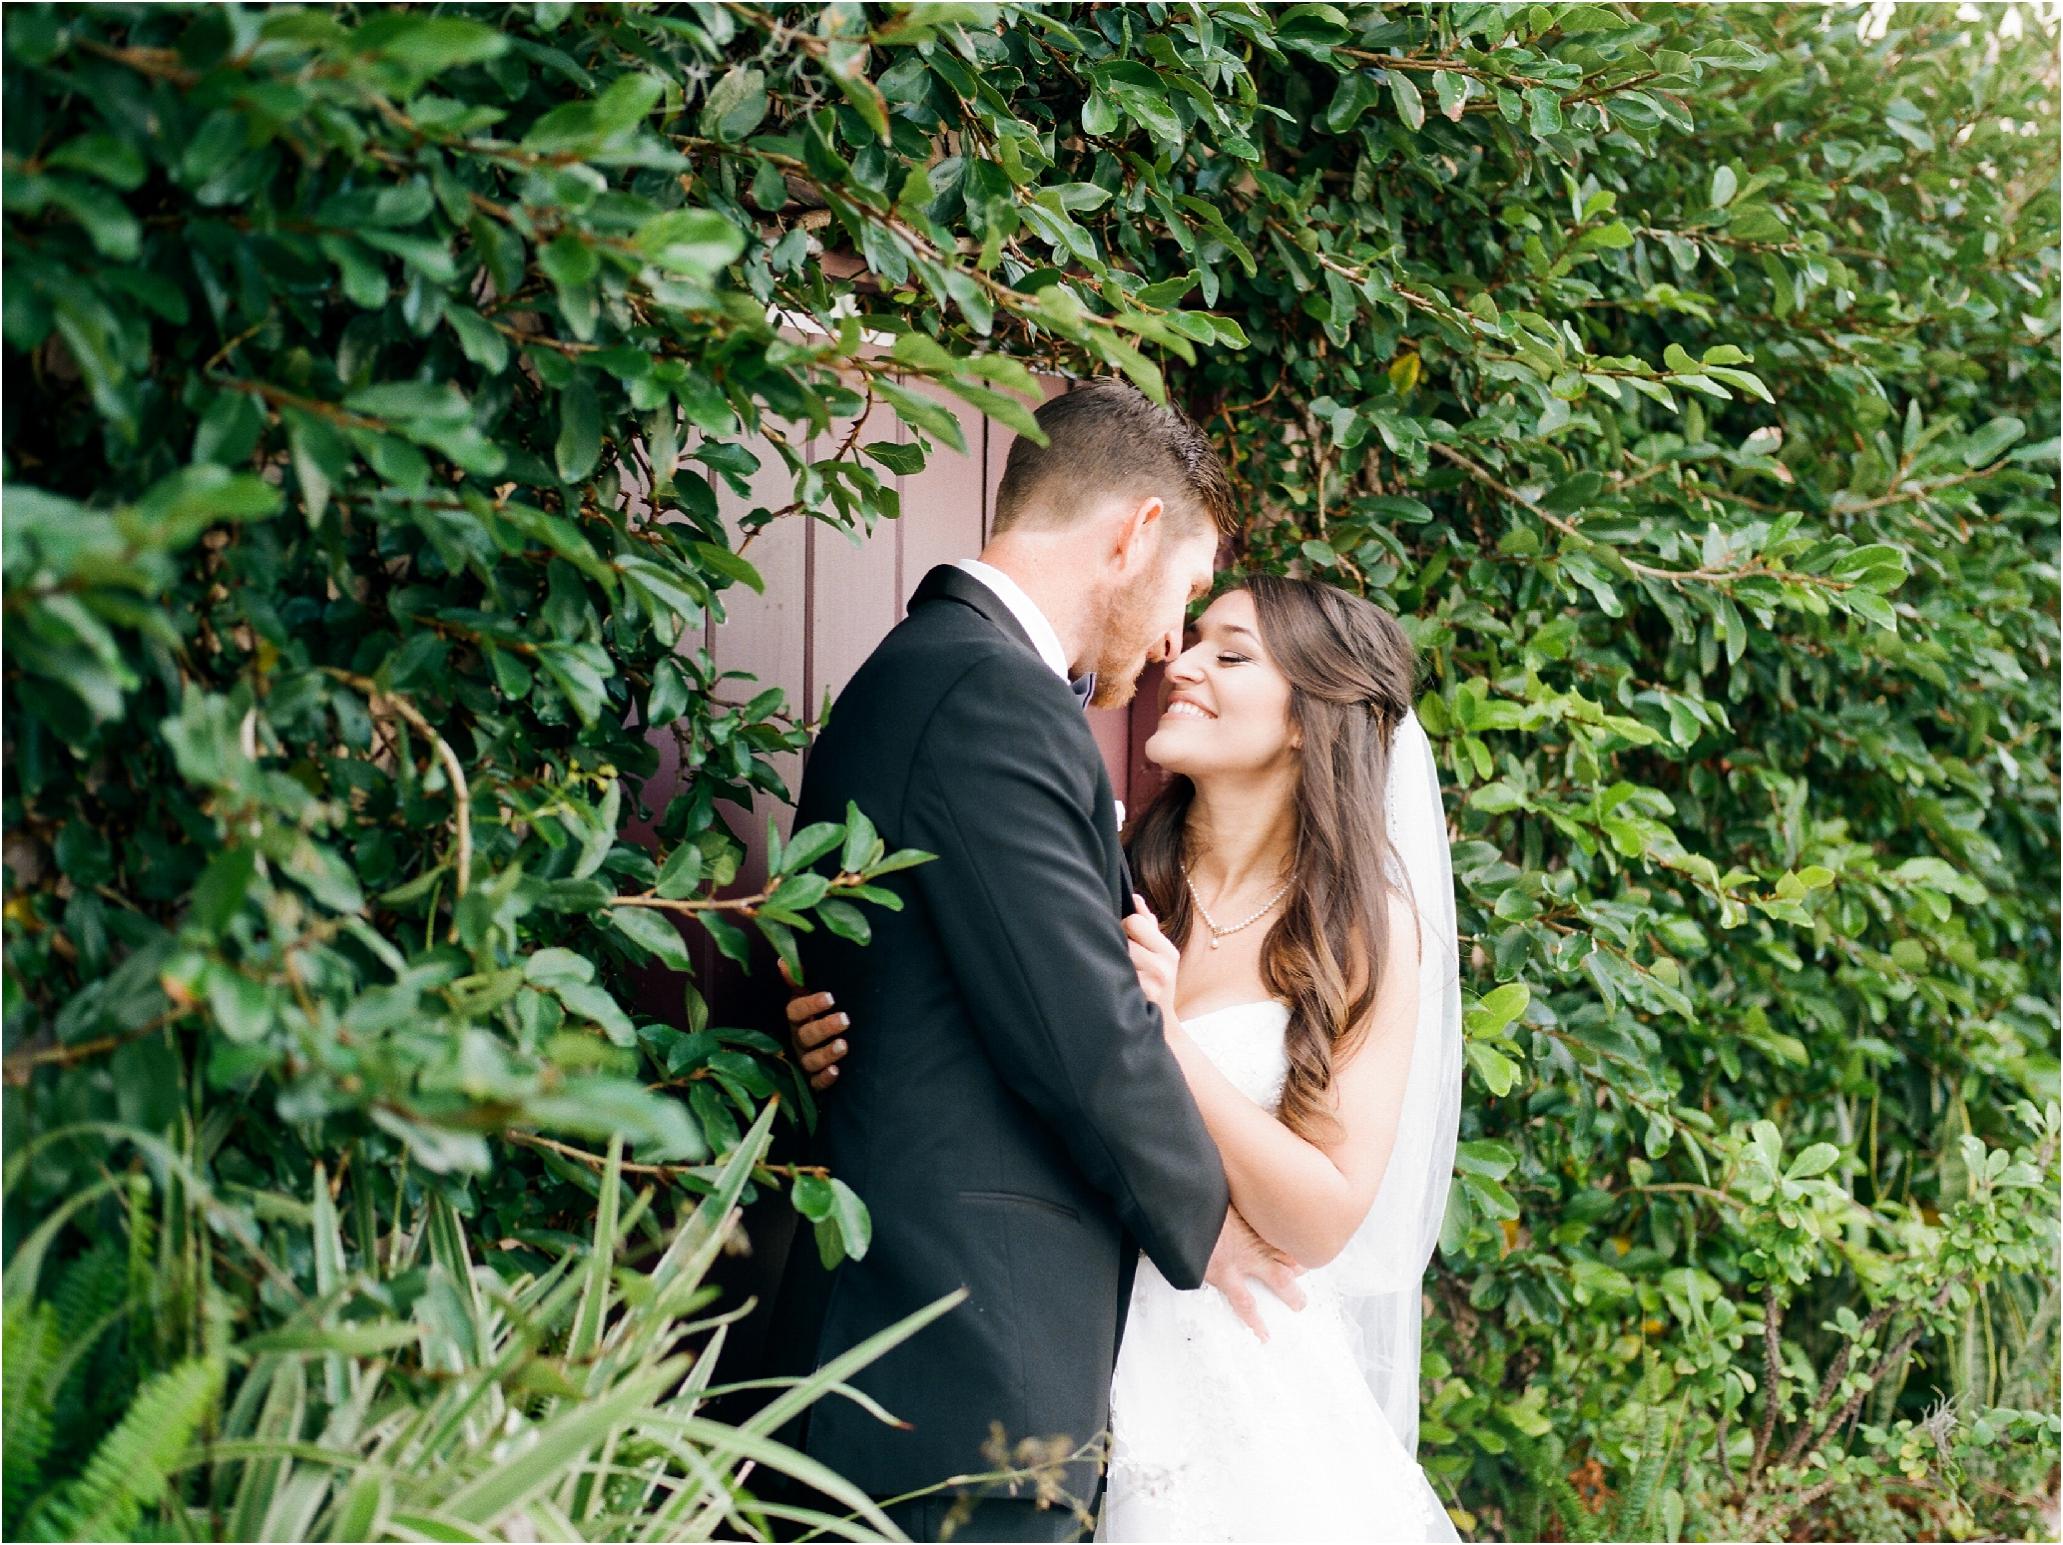 Lisa Silva Photography- Ponte Vedra Beach and Jacksonville, Florida Fine Art Film Wedding Photography- Wedding at The White Room Villa Blanca in St. Augustine, Florida_0037.jpg